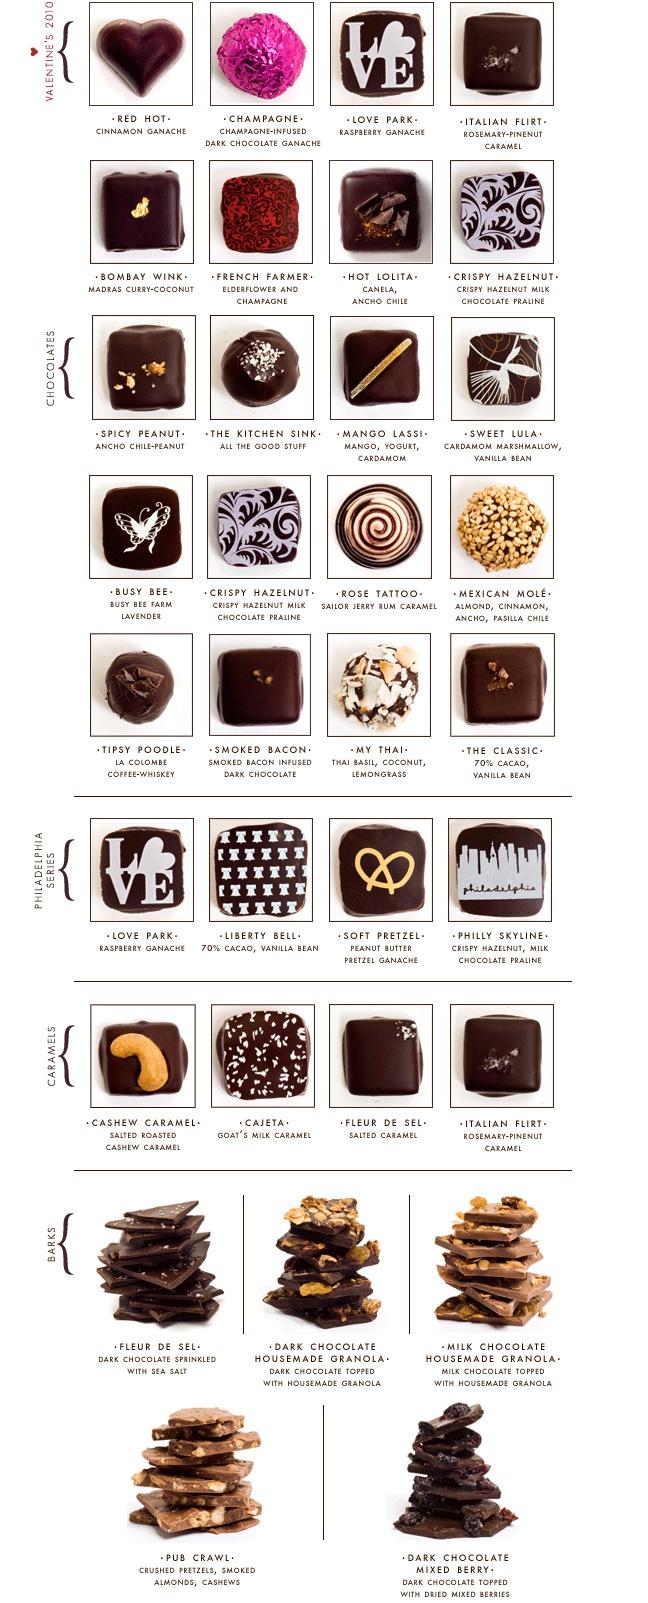 Im gonna be my own Valentine and buy myself these....Artisanal Chocolates by Marcie Blaine!